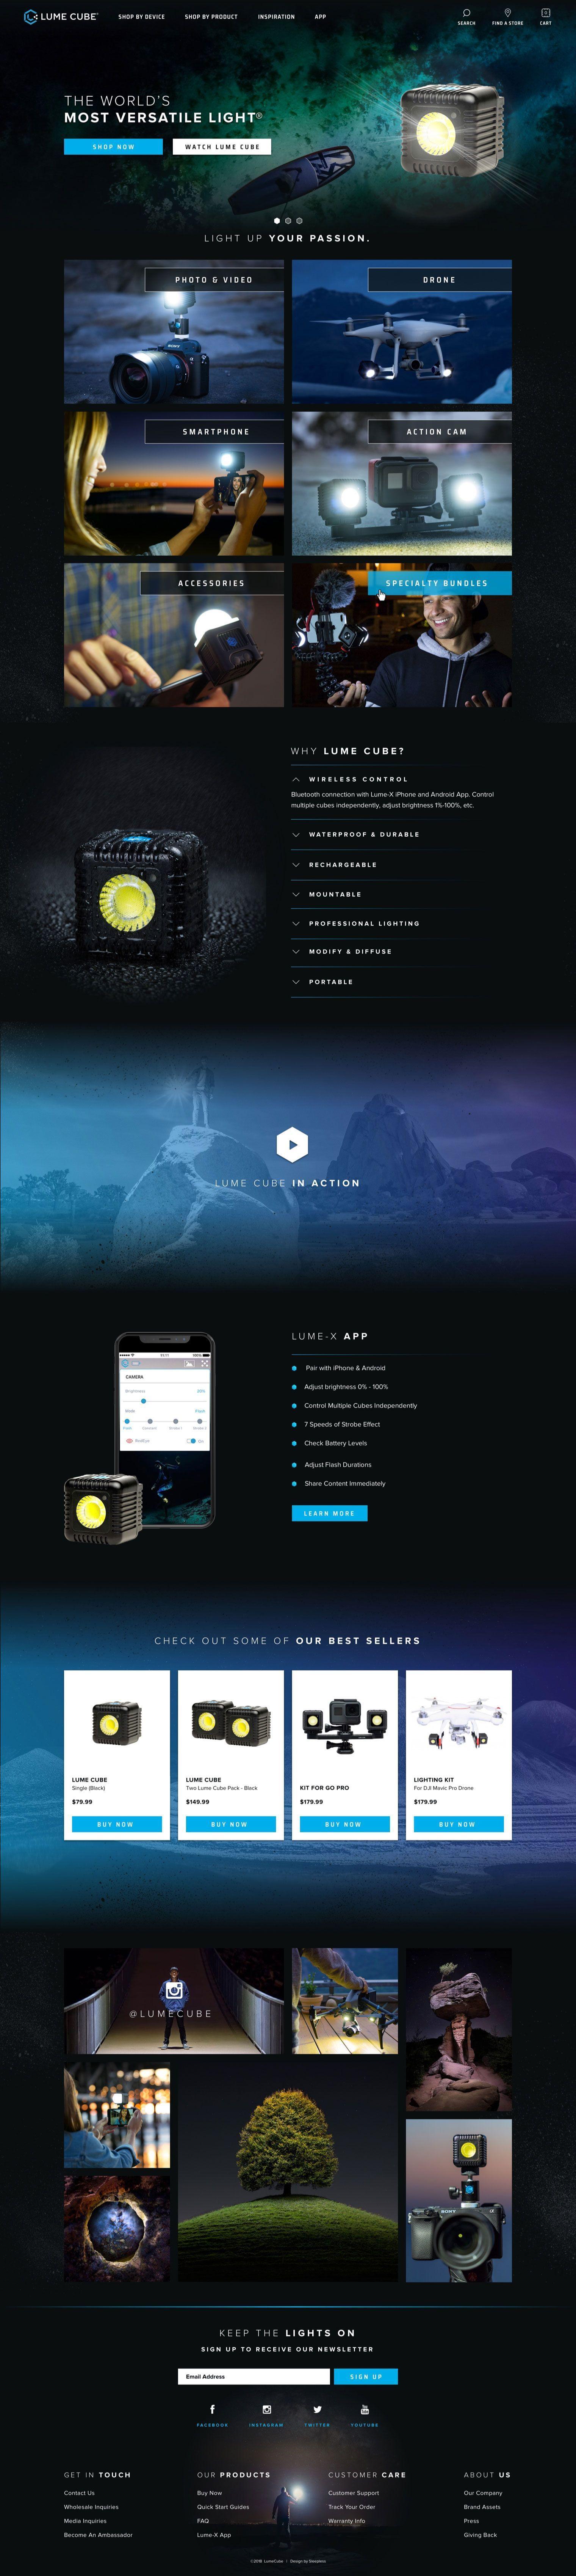 Lumecube Homepage